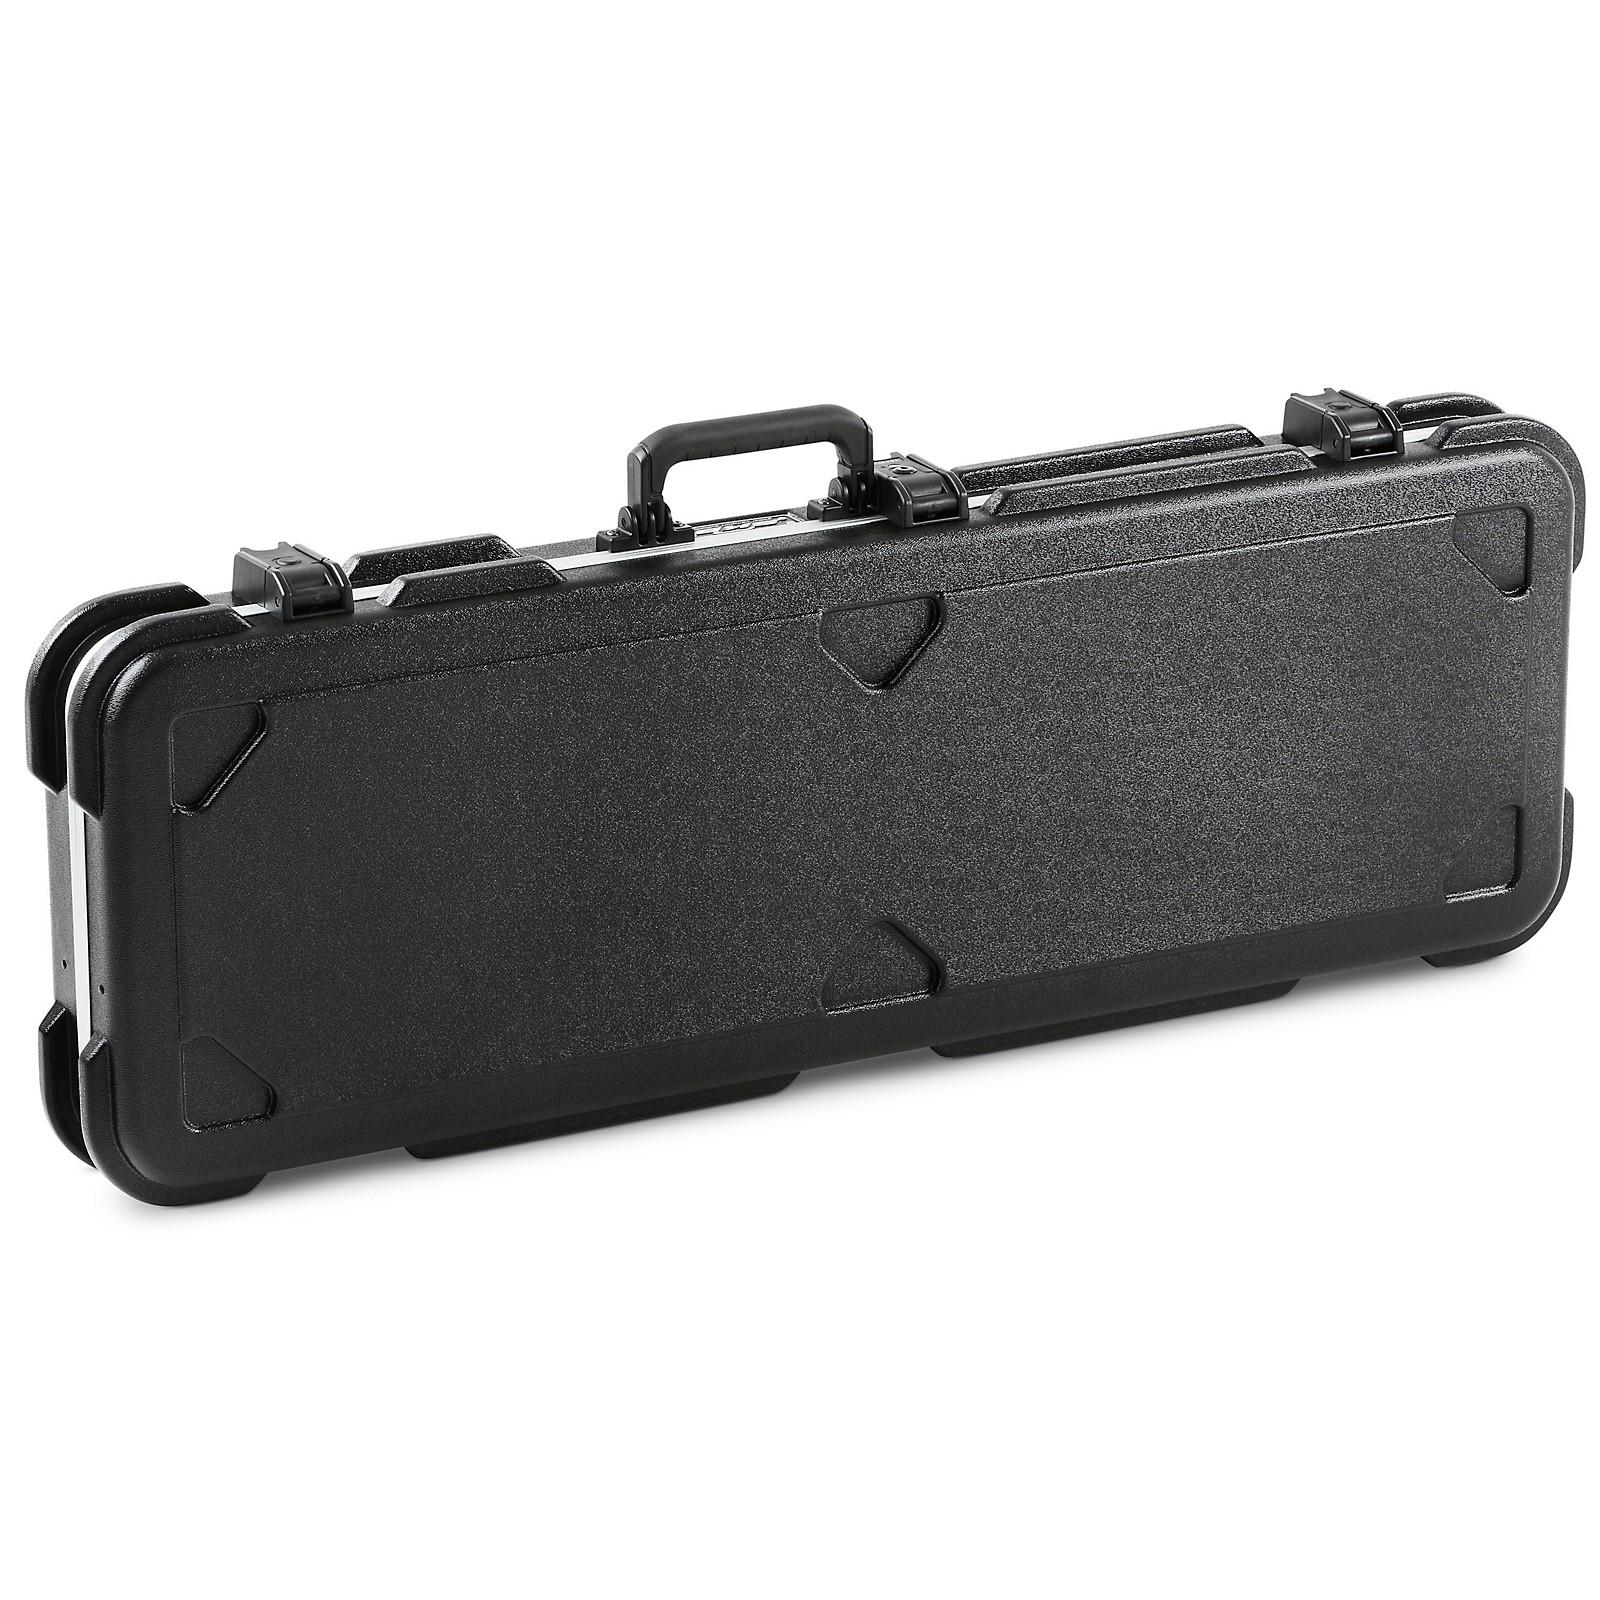 Open Box SKB SKB-66 Deluxe Universal Electric Guitar Case